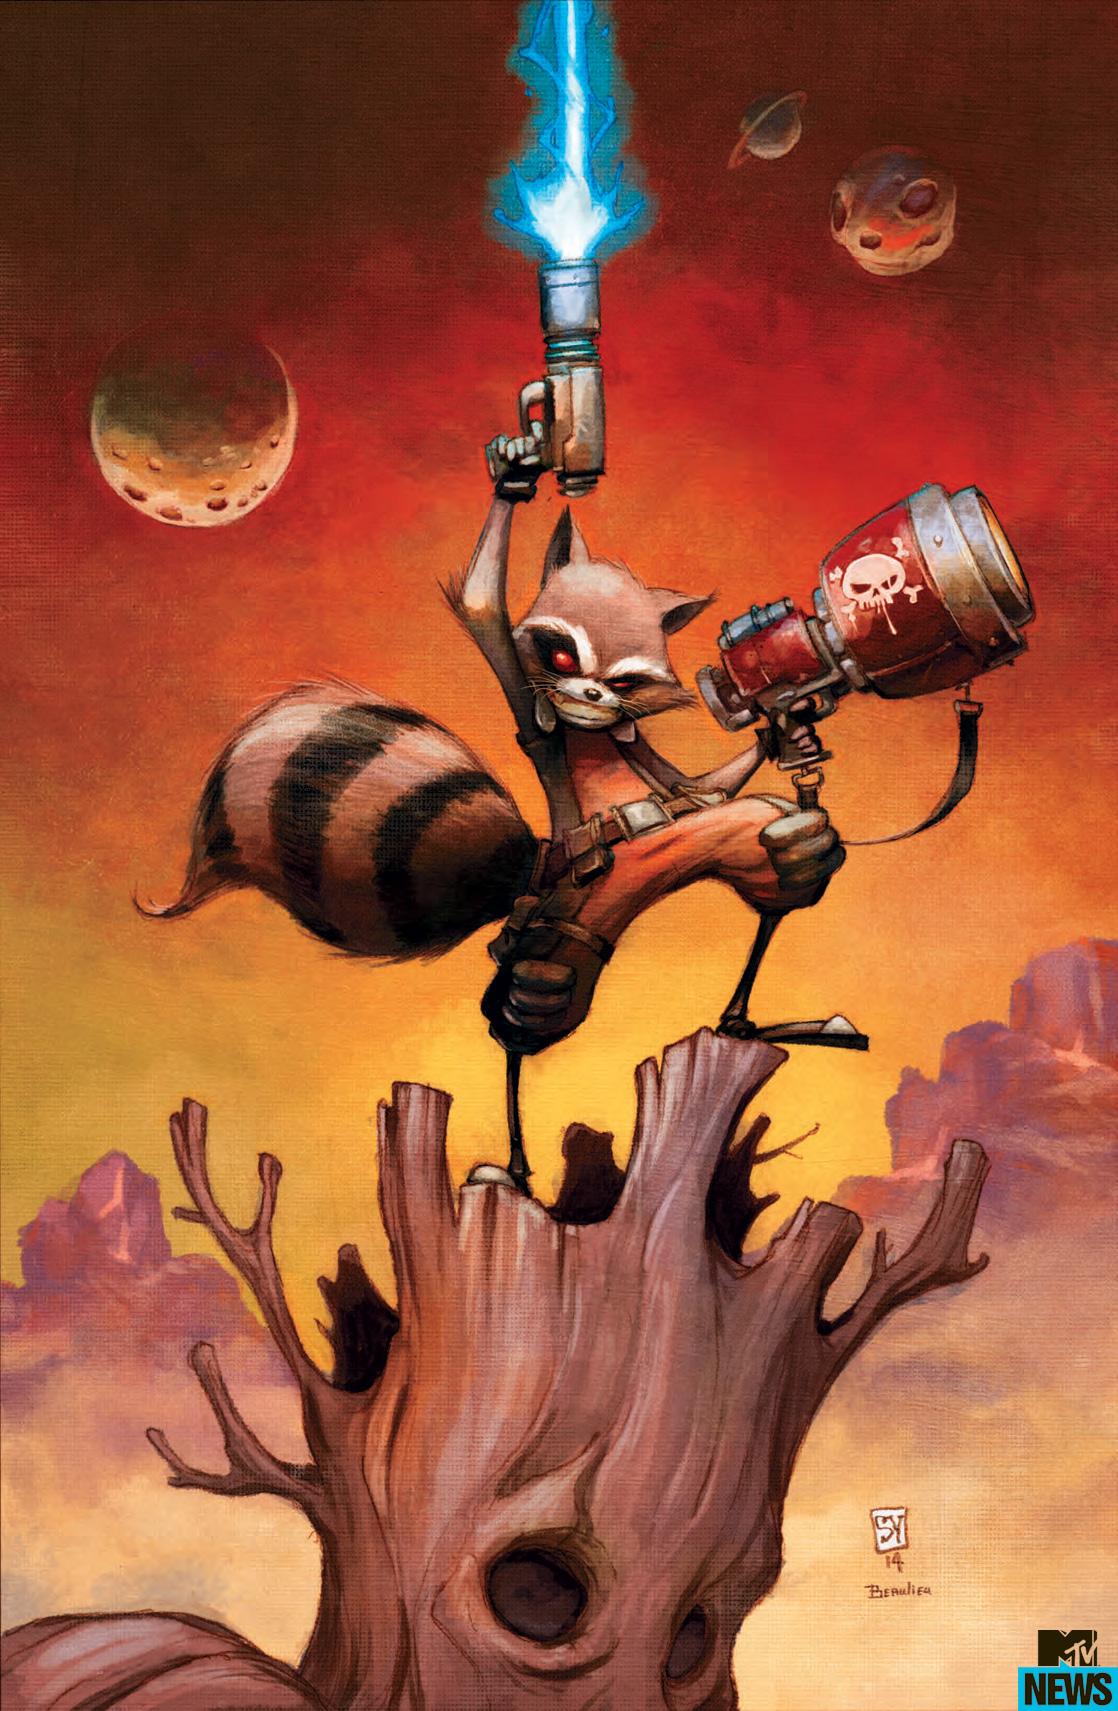 Drawn racoon comic Into Rocket Raccoon Off Exclusive: